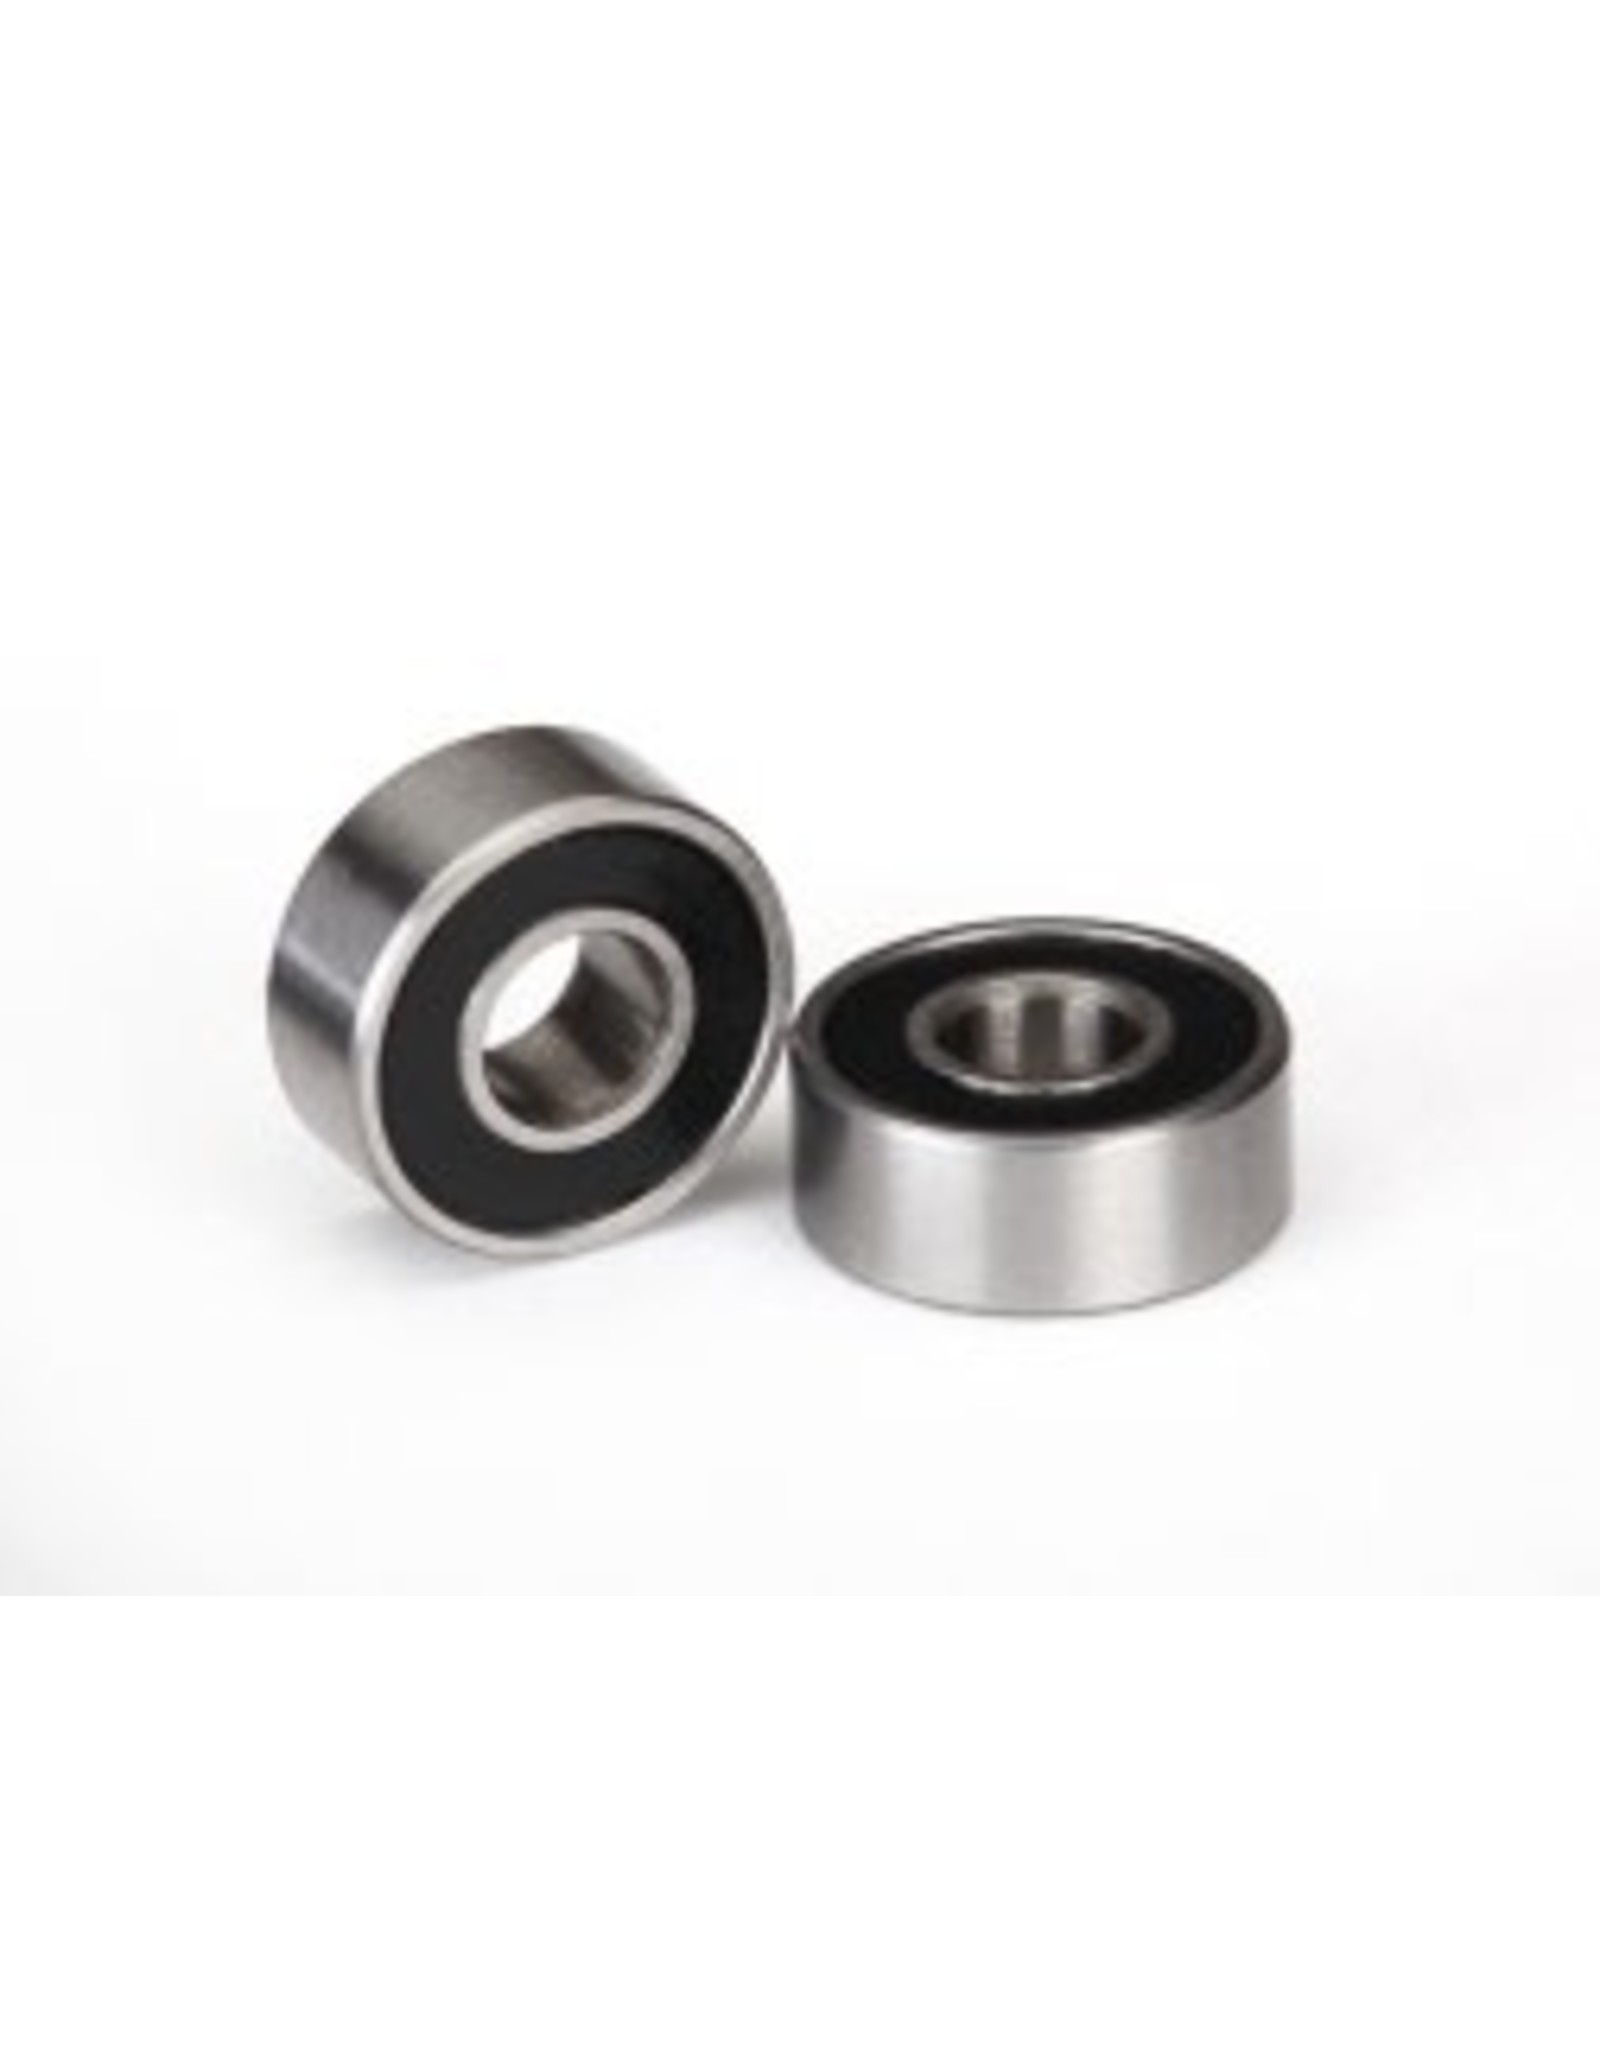 Traxxas Ball bearings, black rubber sealed (4x10x4mm) (2)  (TRA5104A)